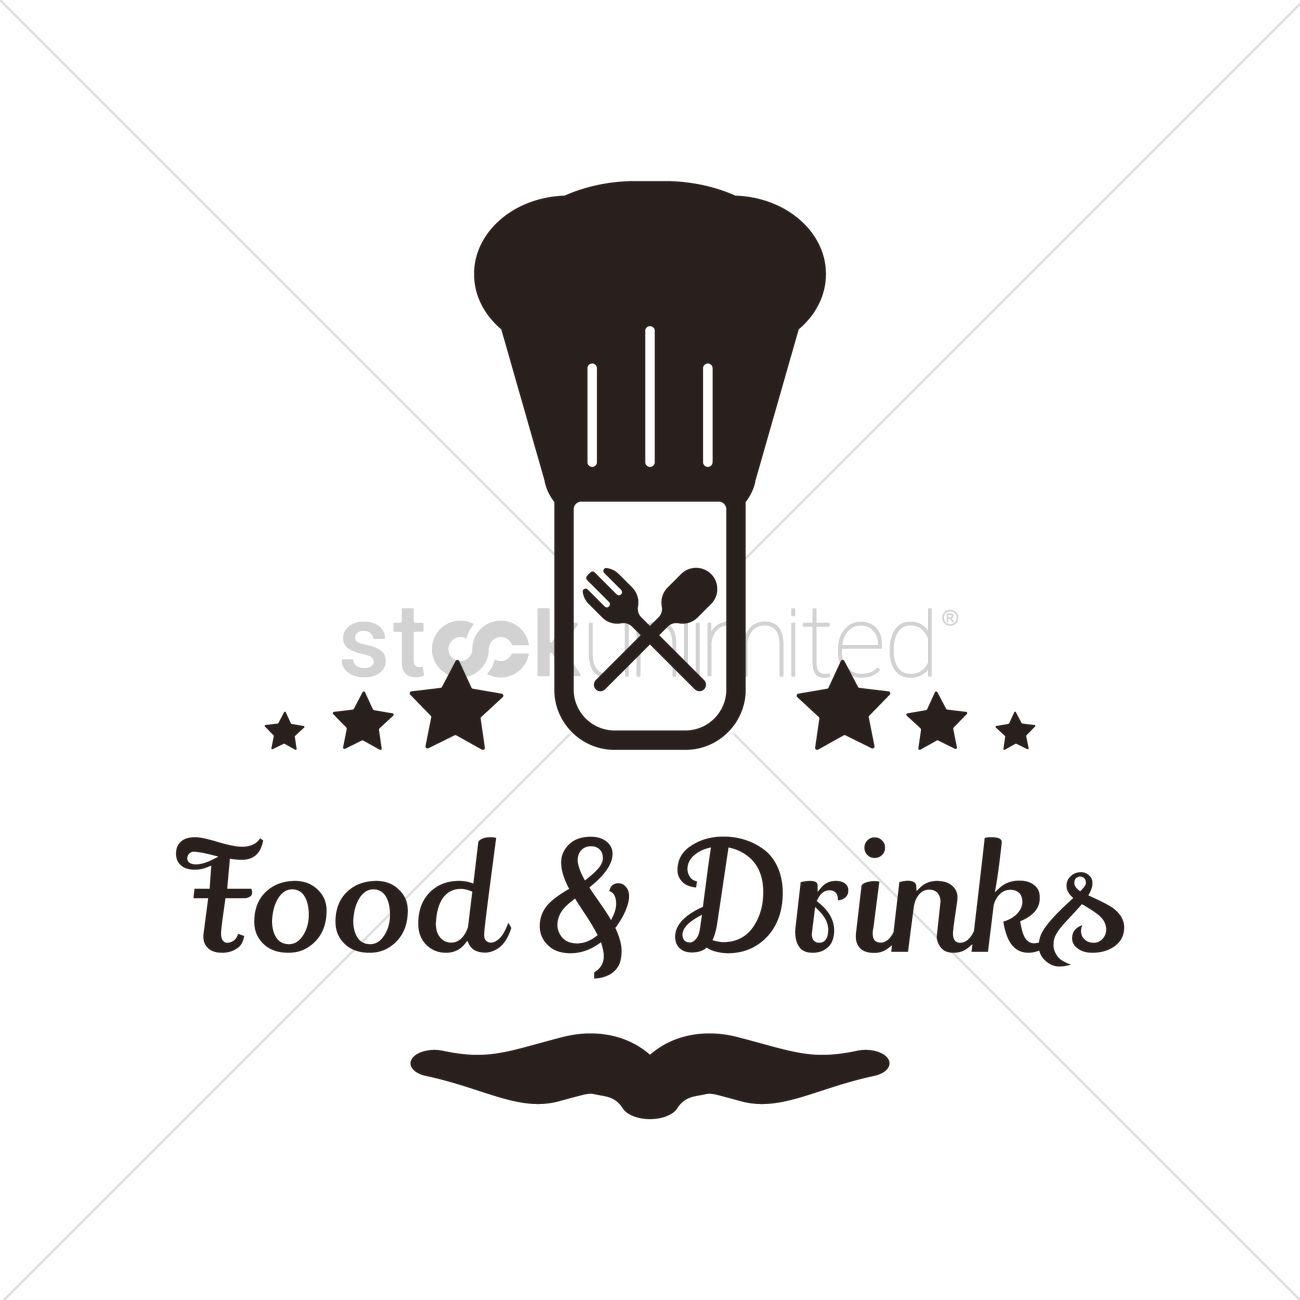 Food And Drinks Menu Design Vector Image